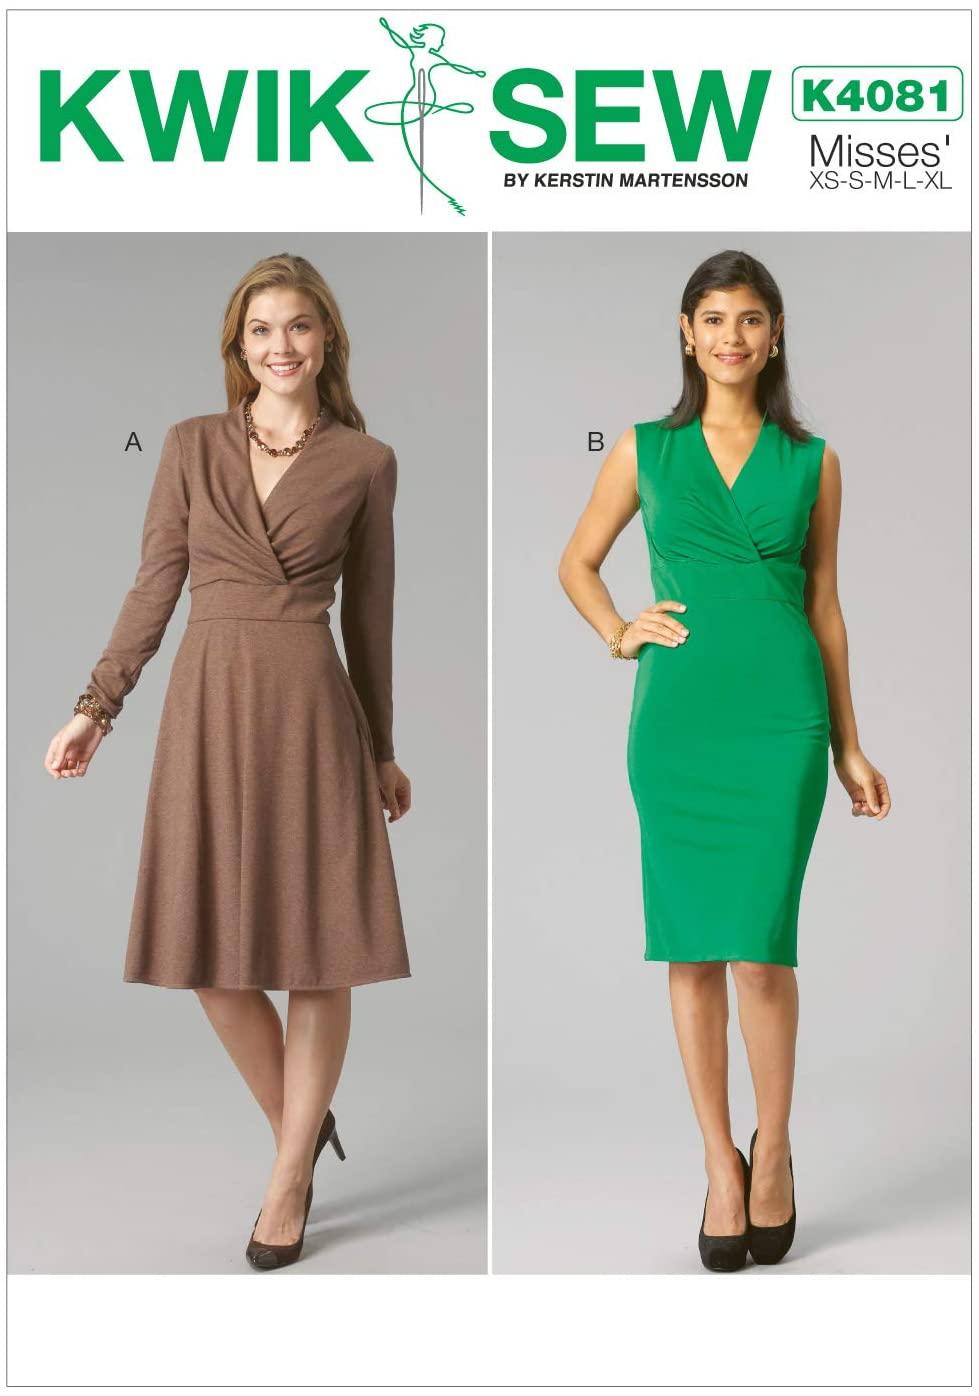 KWIK-SEW PATTERNS K4081 Misses' Dresses